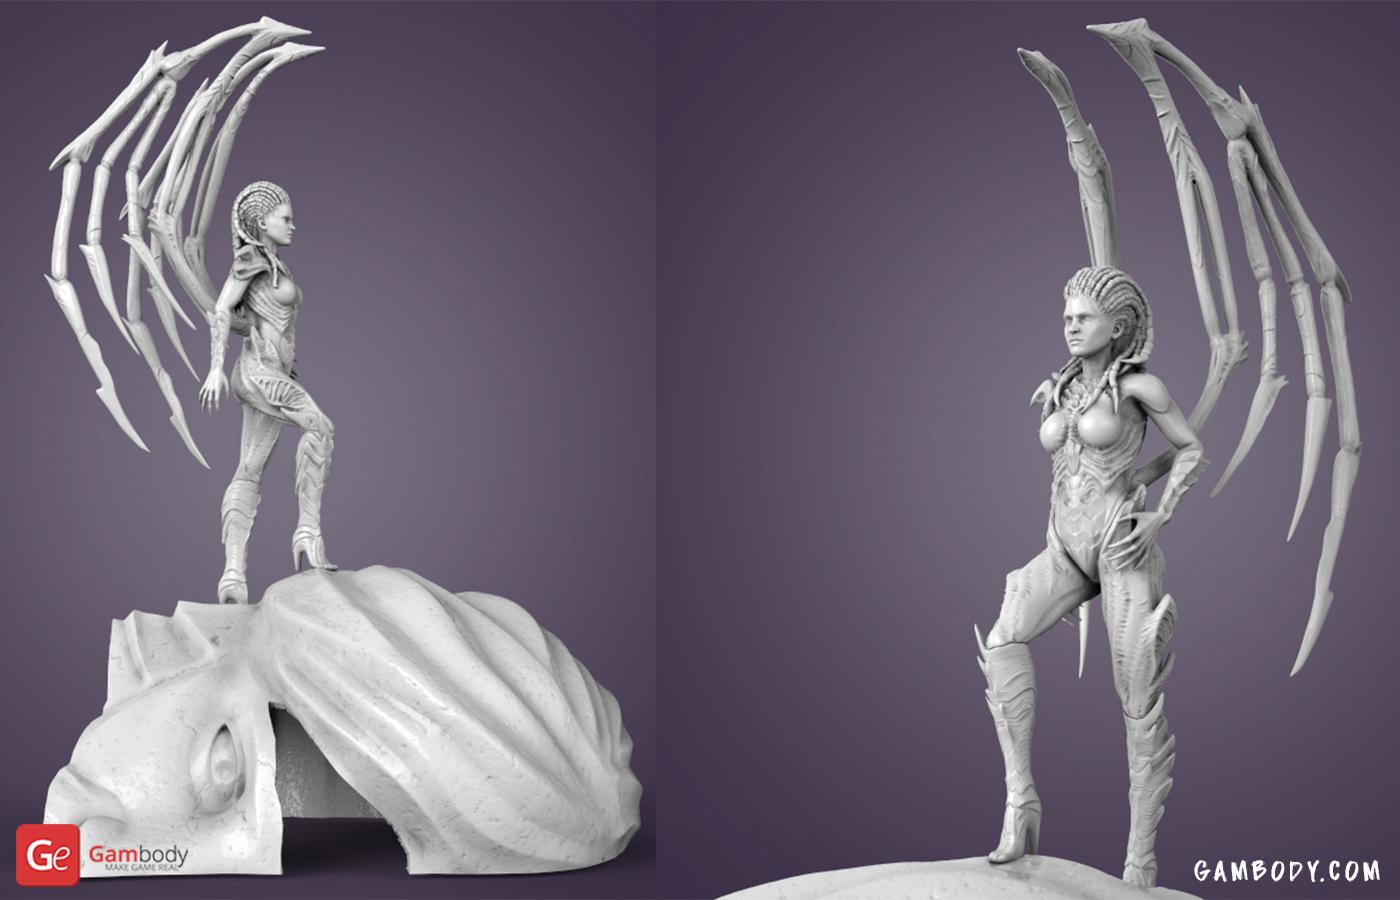 Queen of Blade 3D Printing Figurine